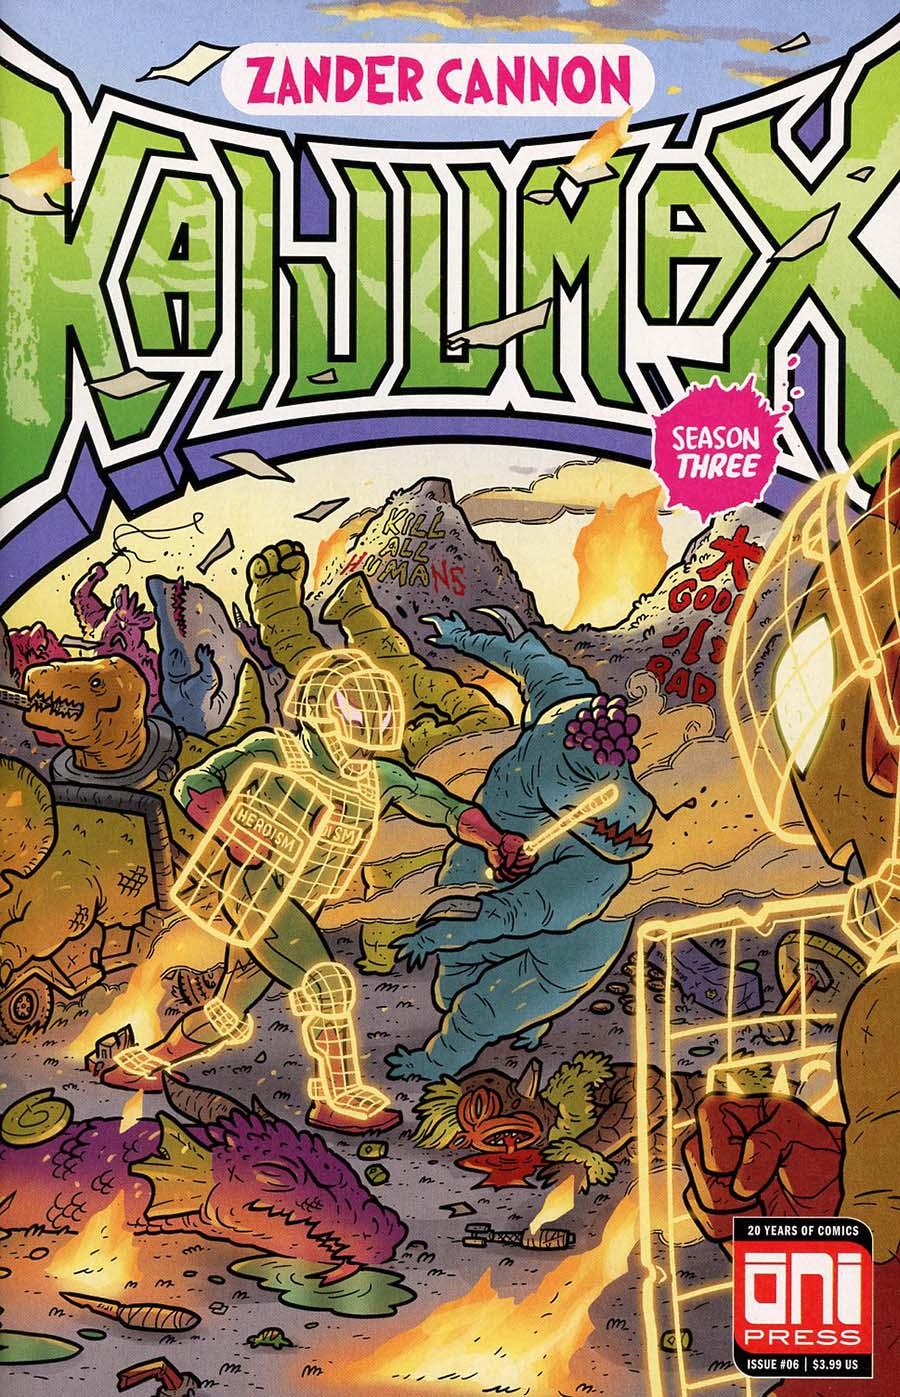 Kaijumax Season 3 #6